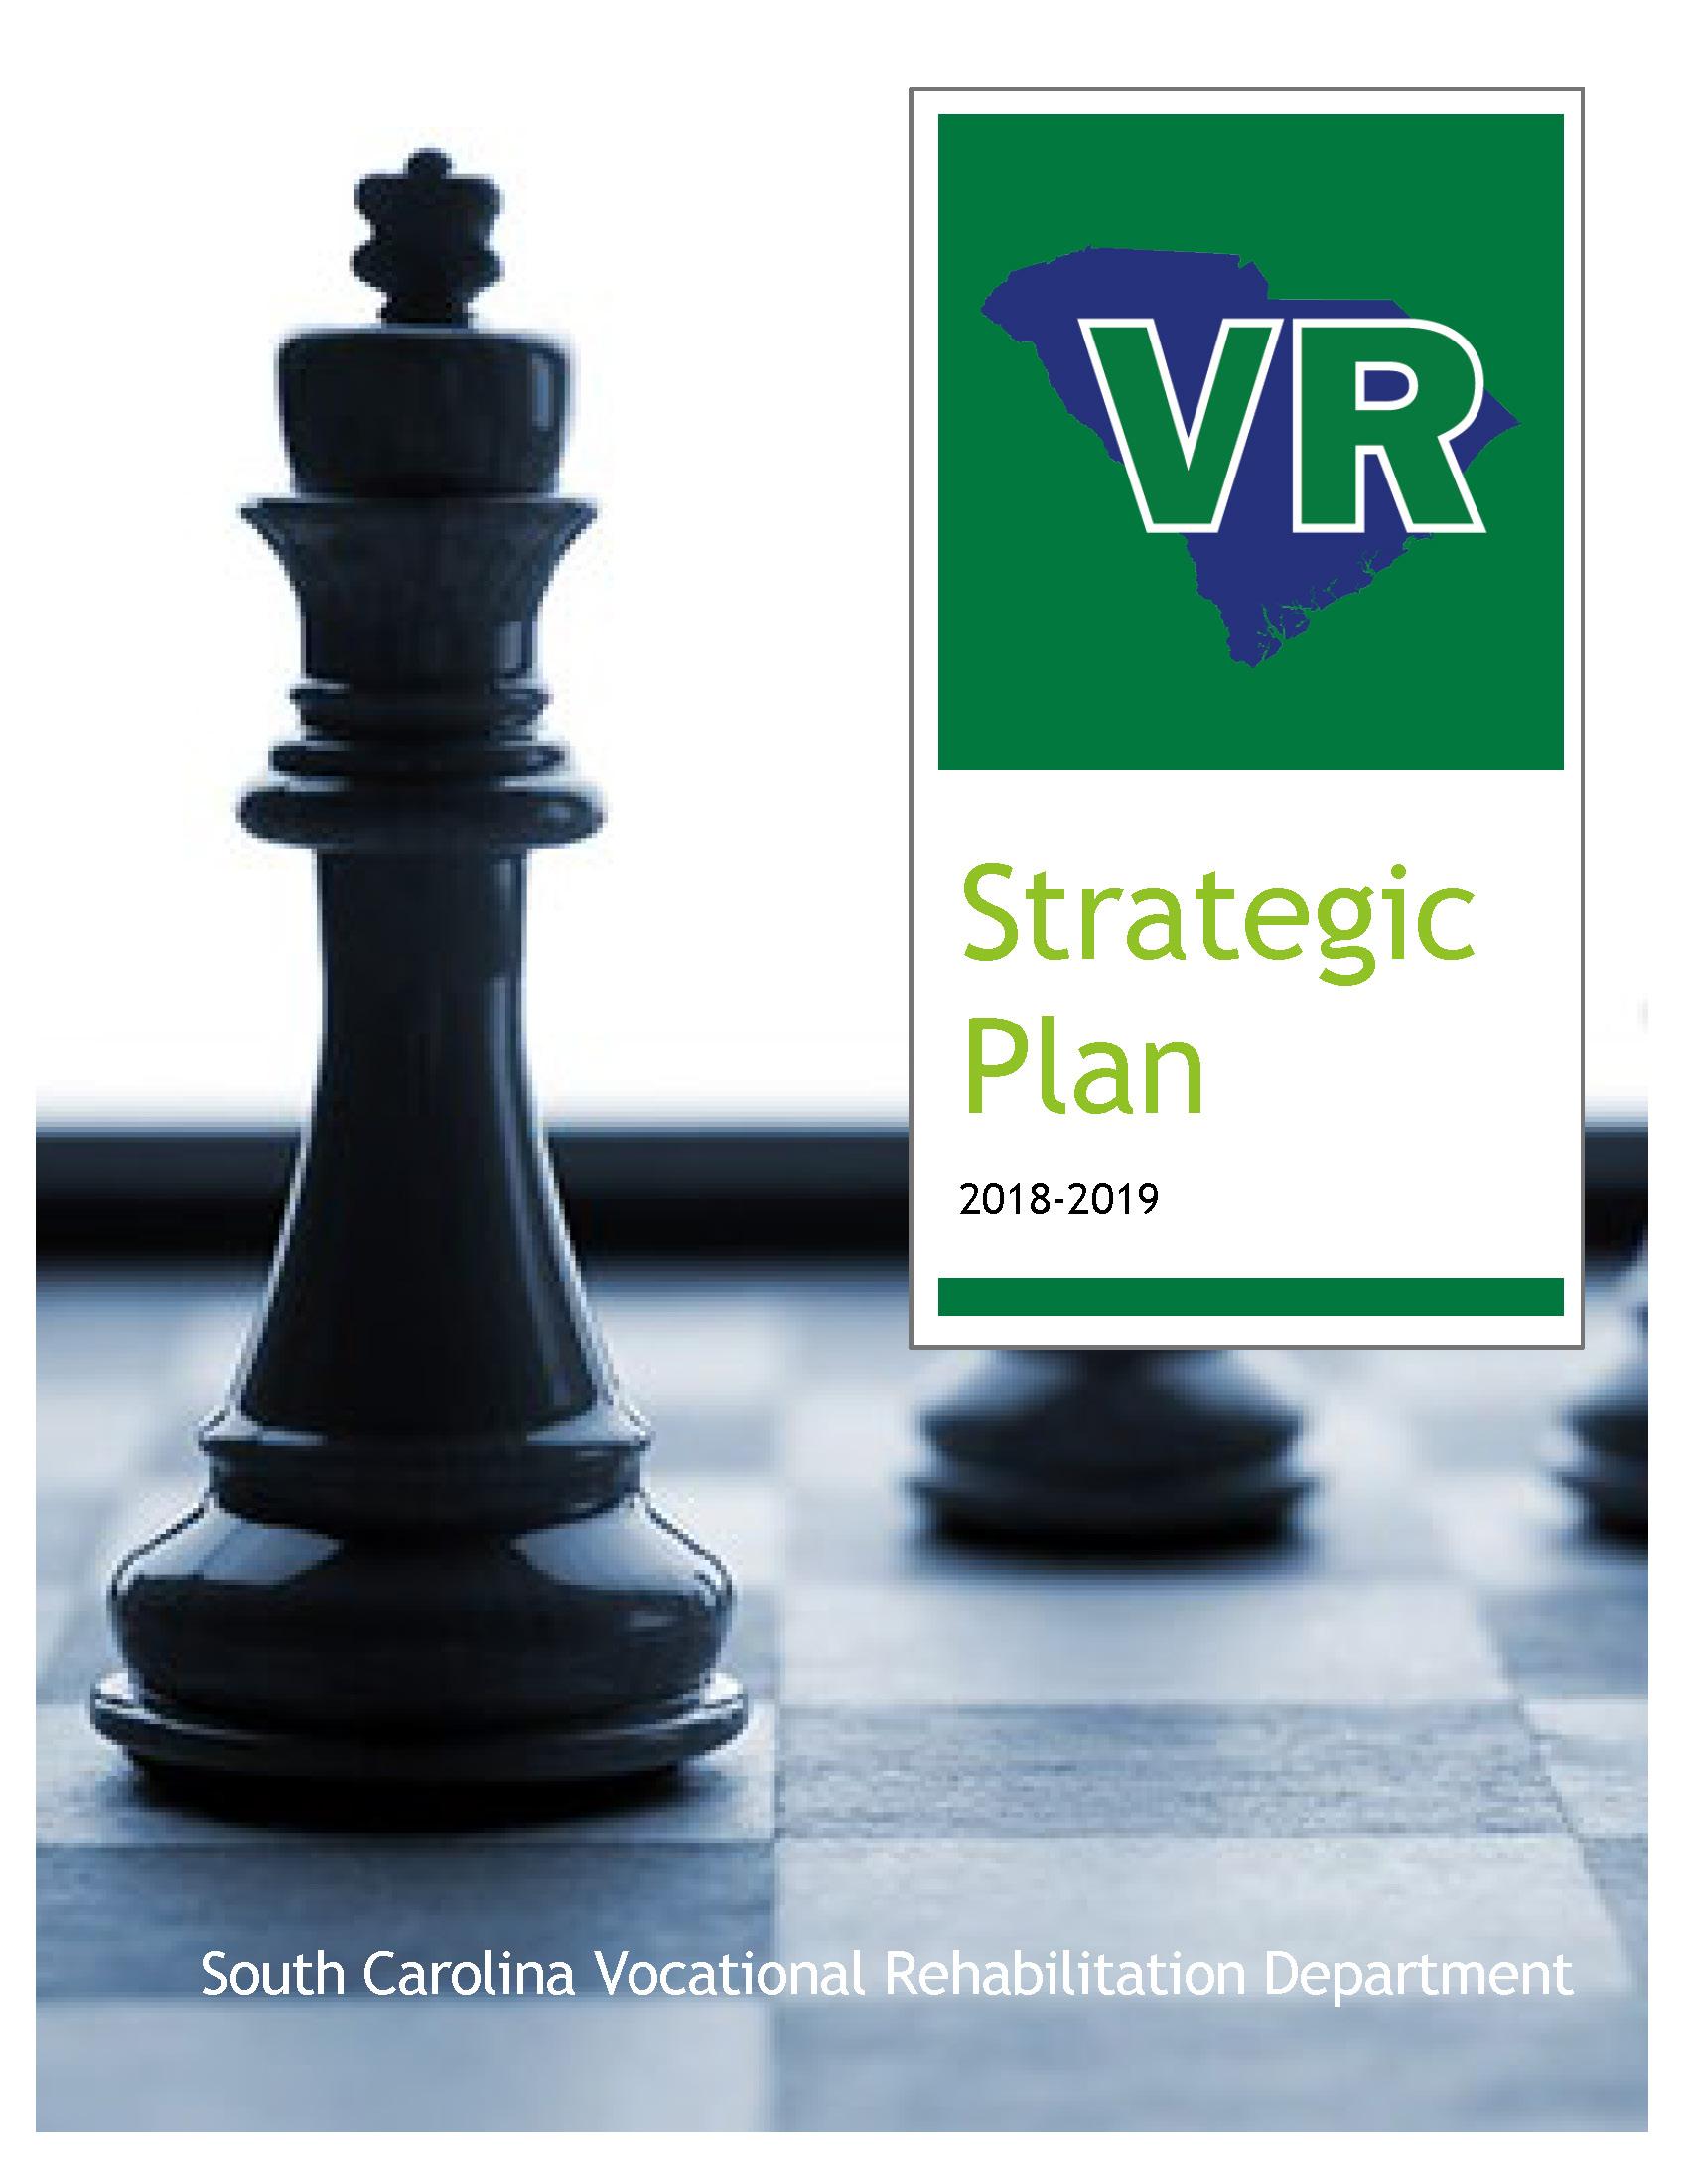 document_2019-strategic-plan_2019-01-25_thumbnail.jpg